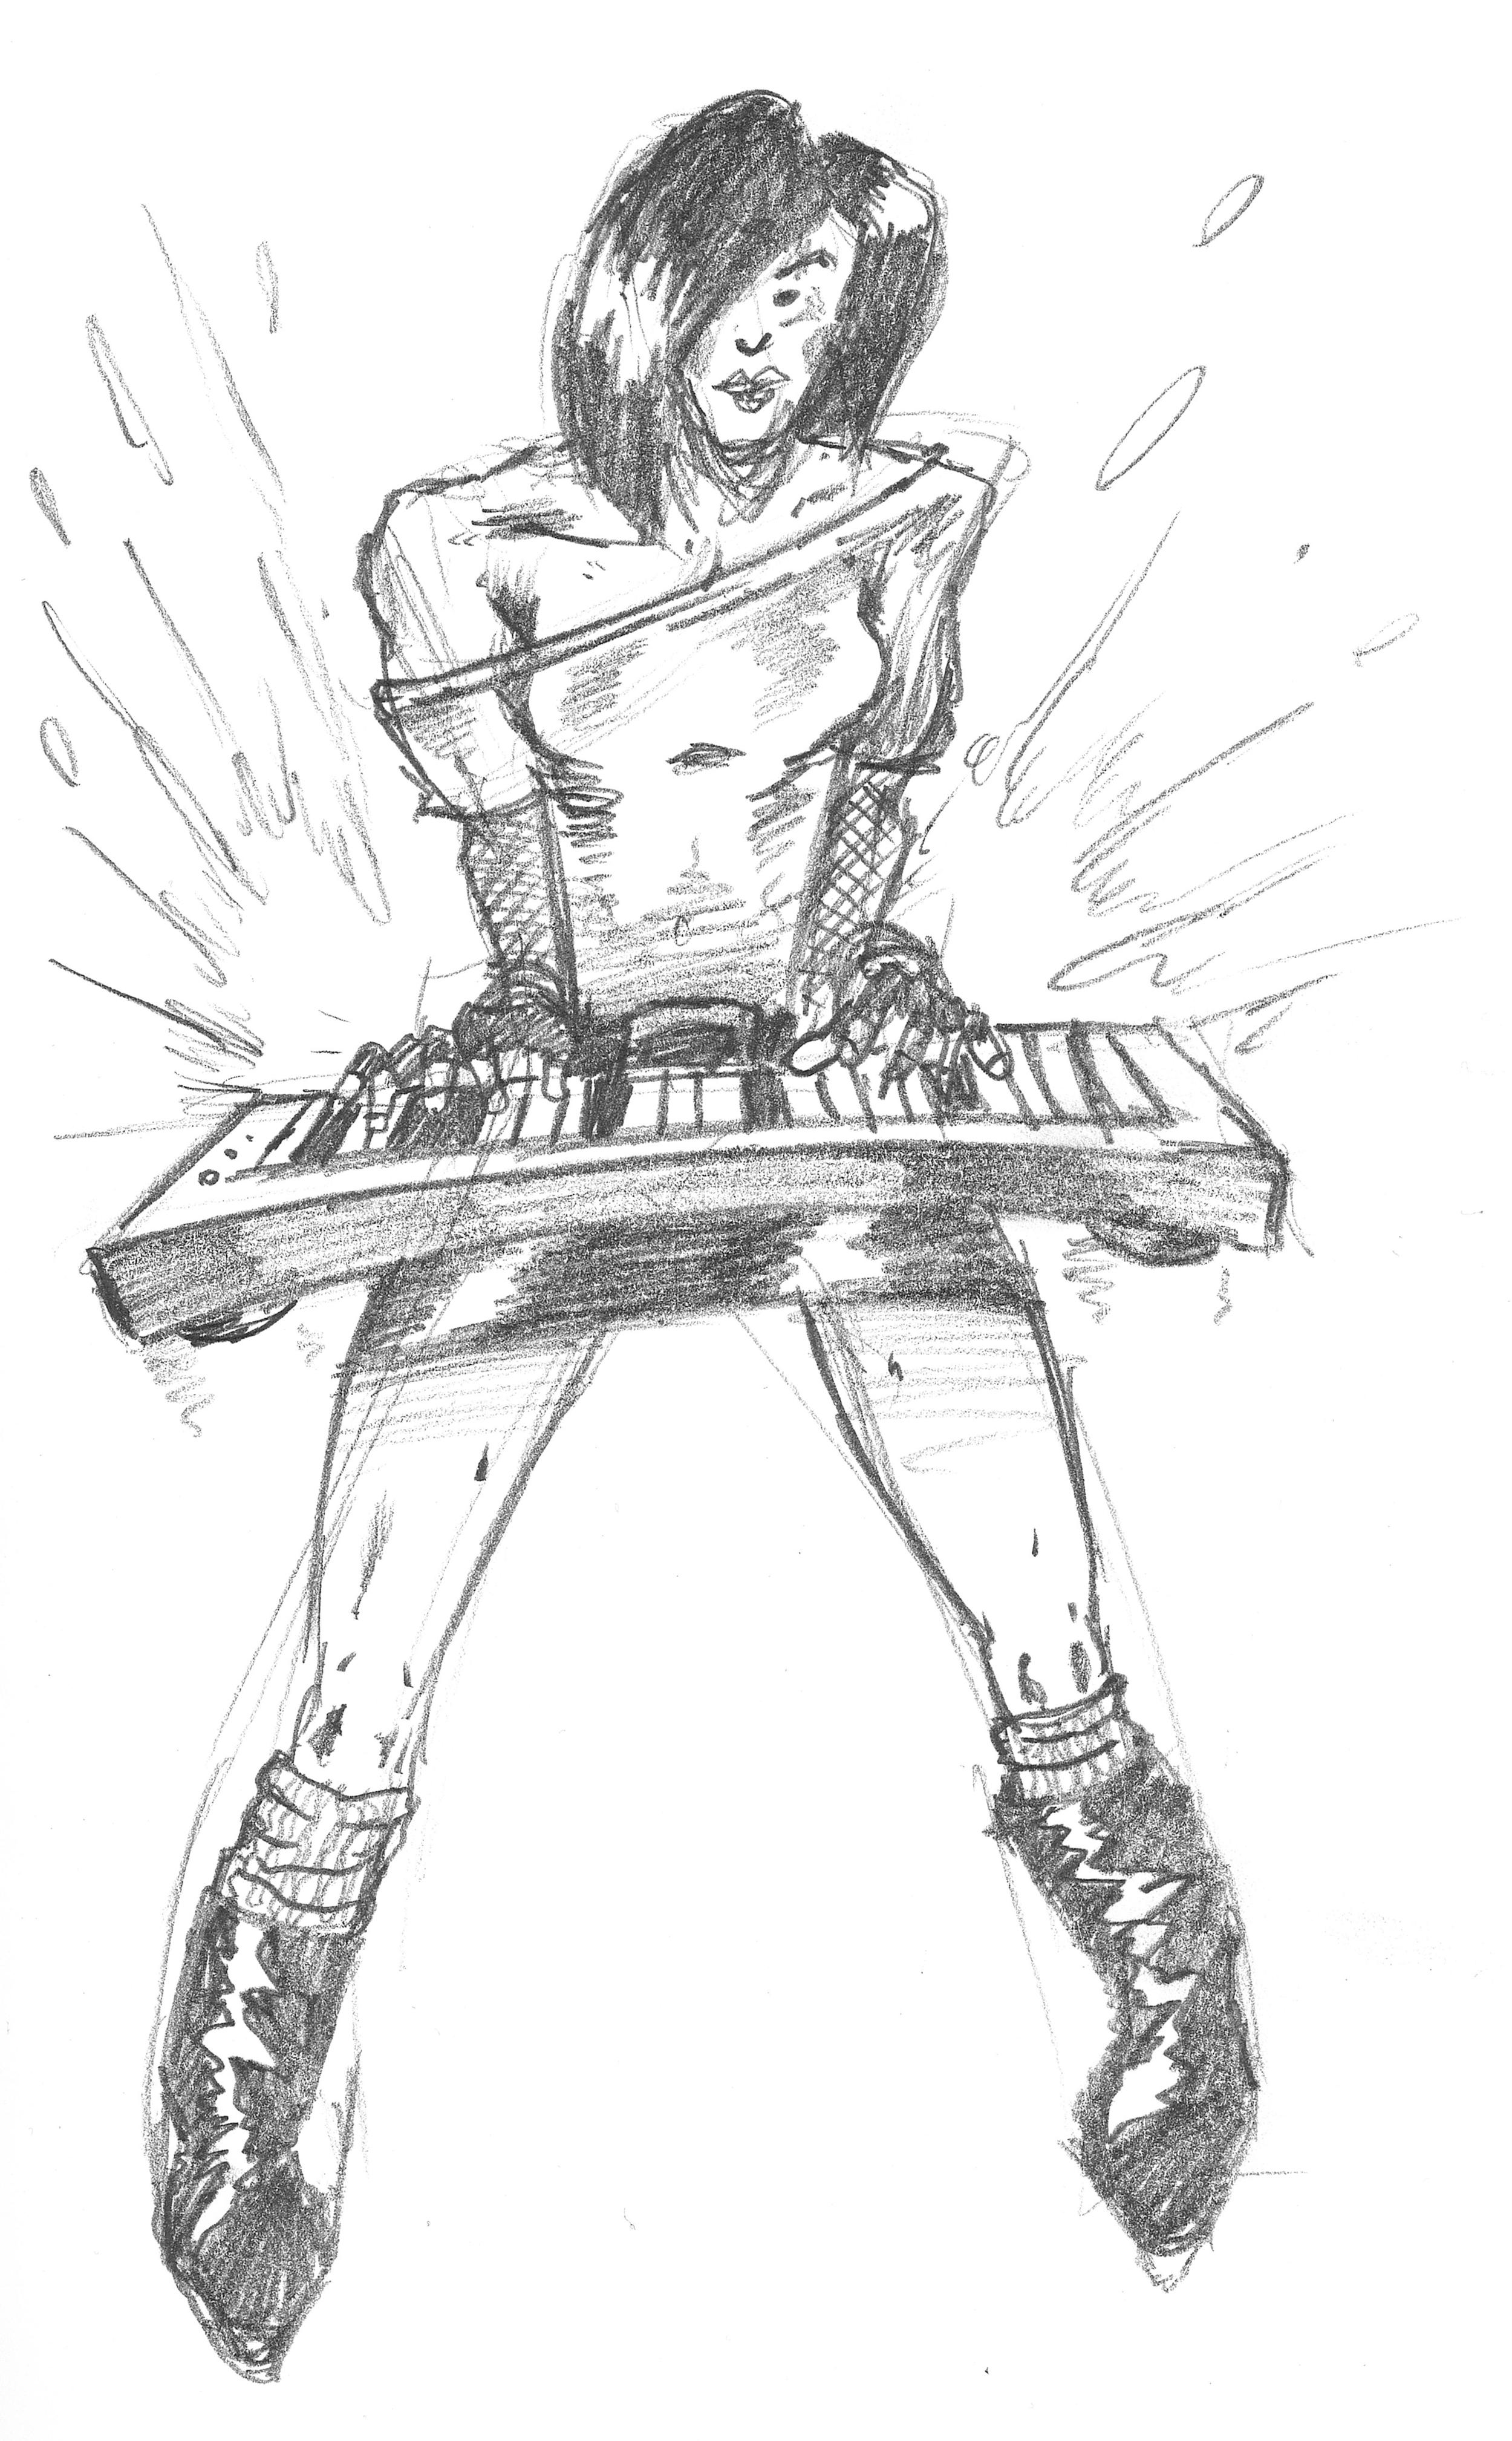 Retro Keyboard Girl